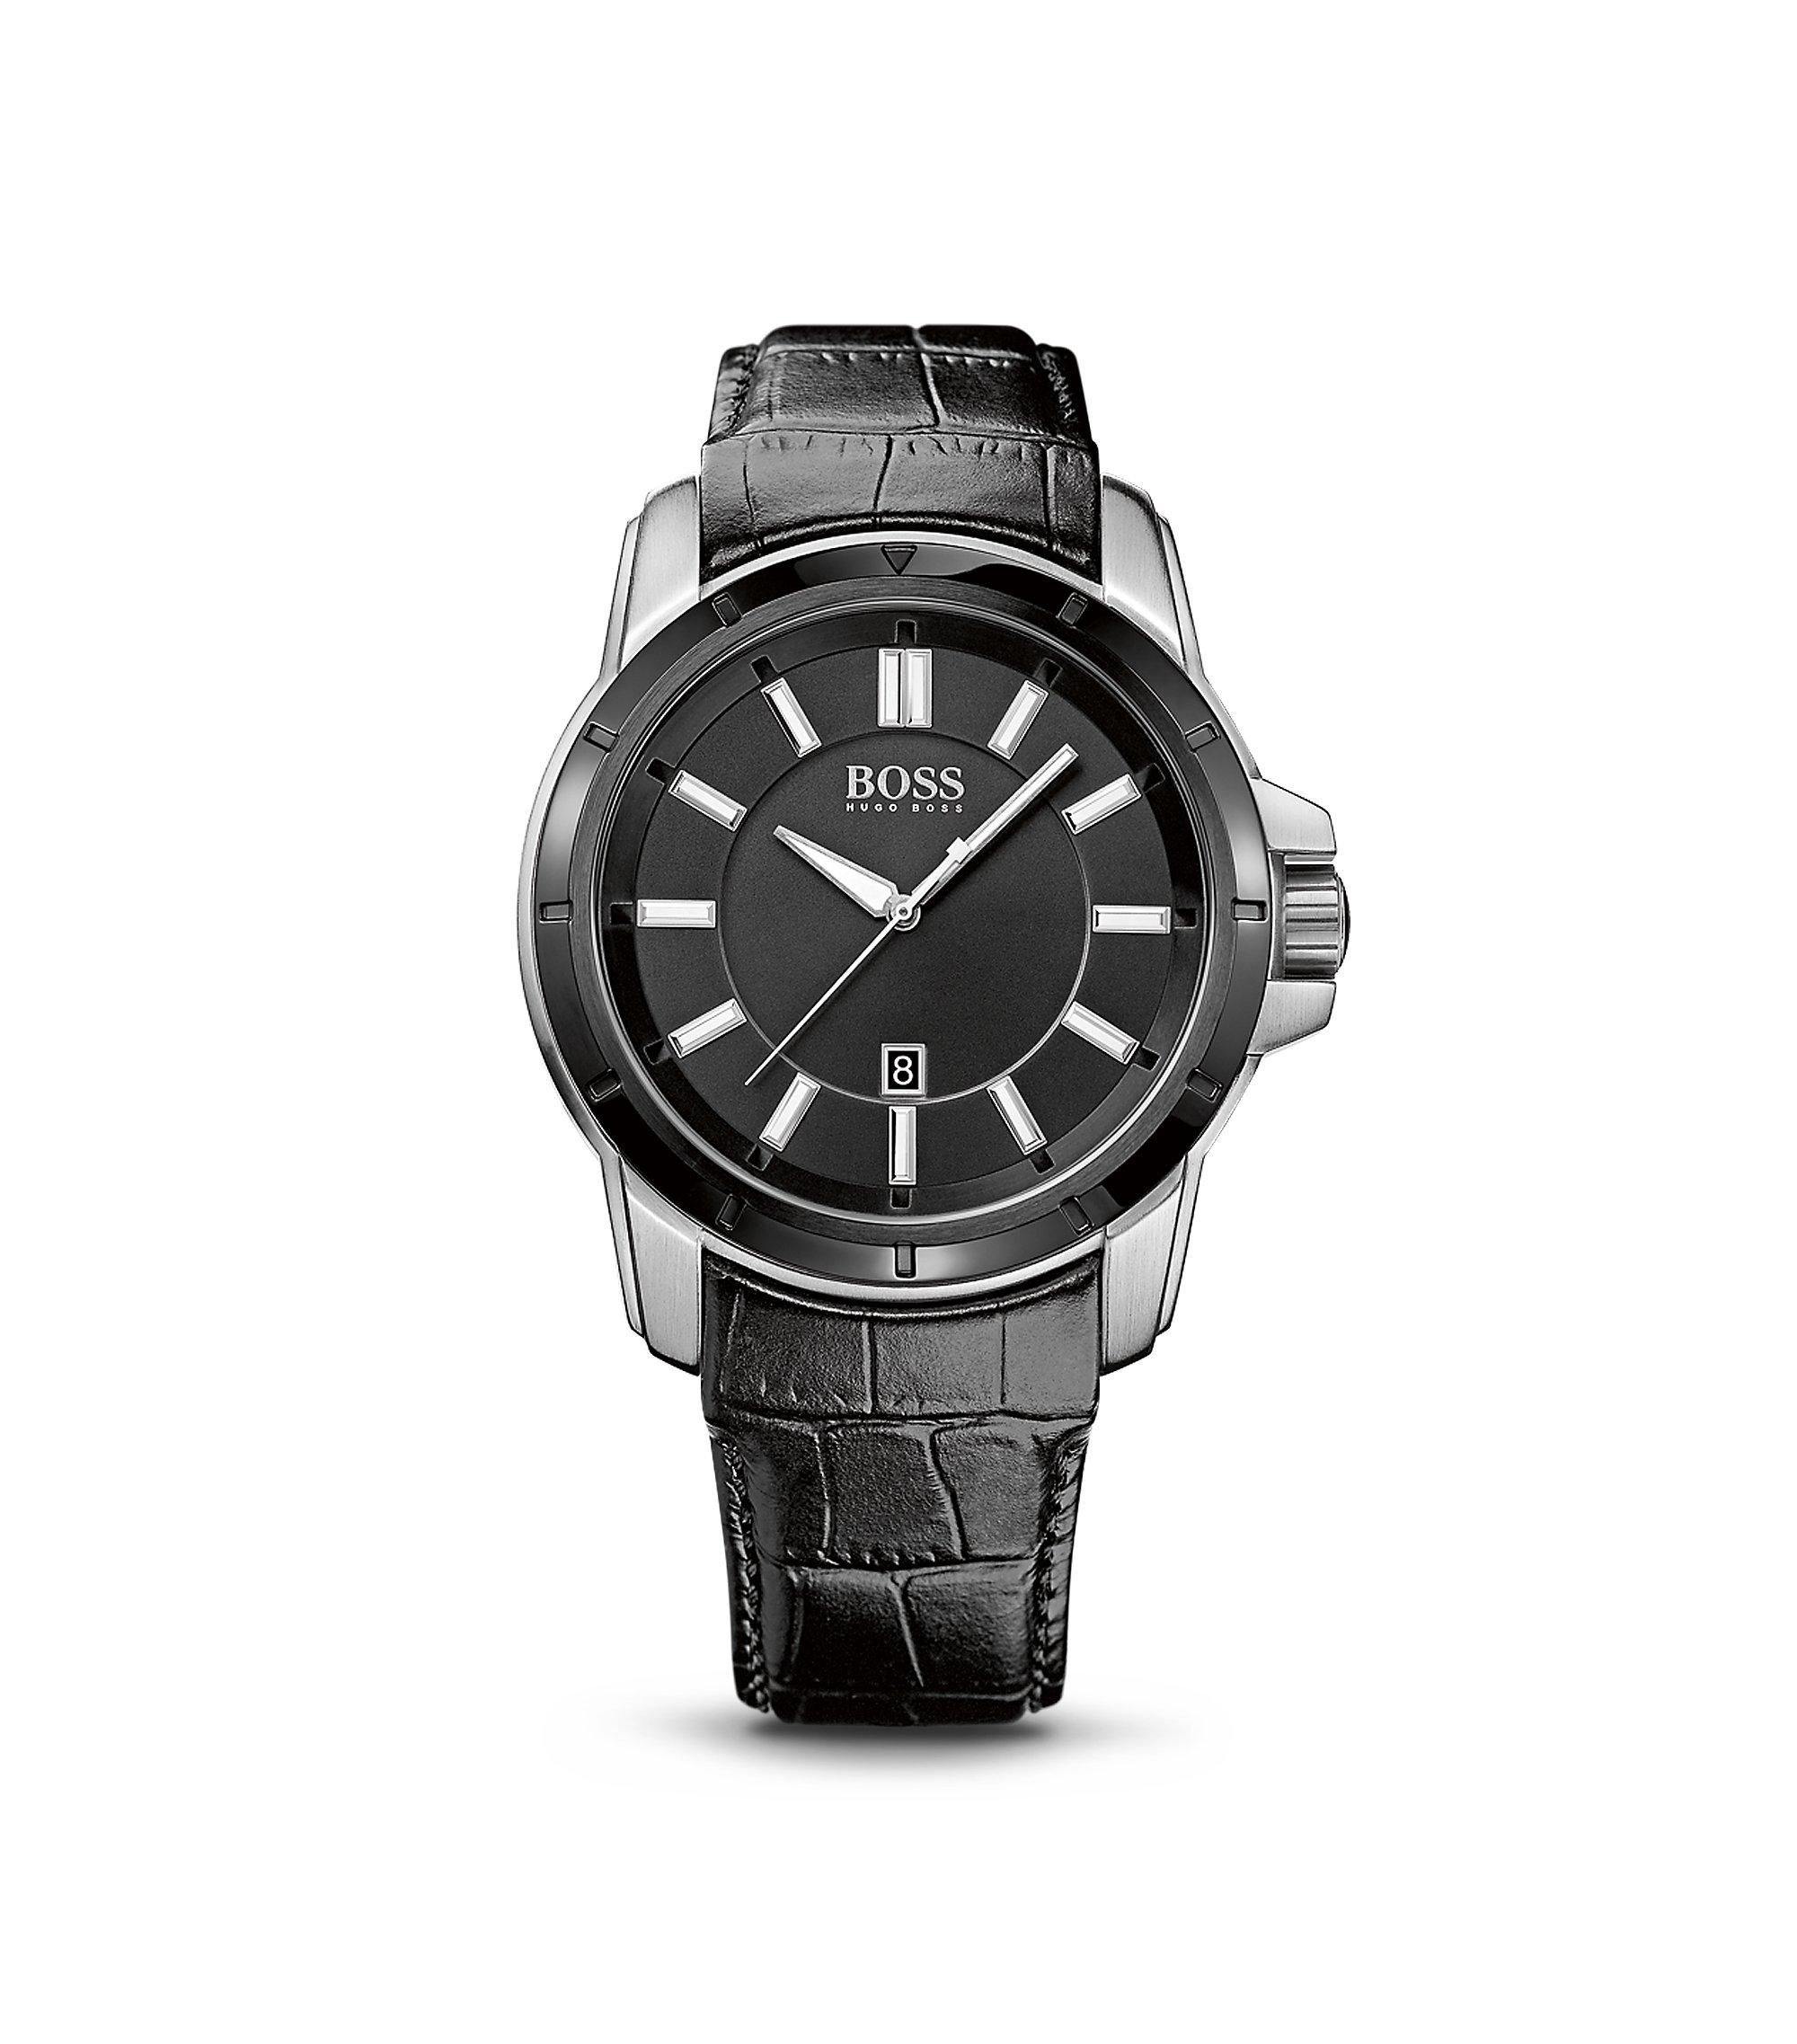 '1512922' | Black Crocodile Leather Strap Quartz Watch, Assorted-Pre-Pack